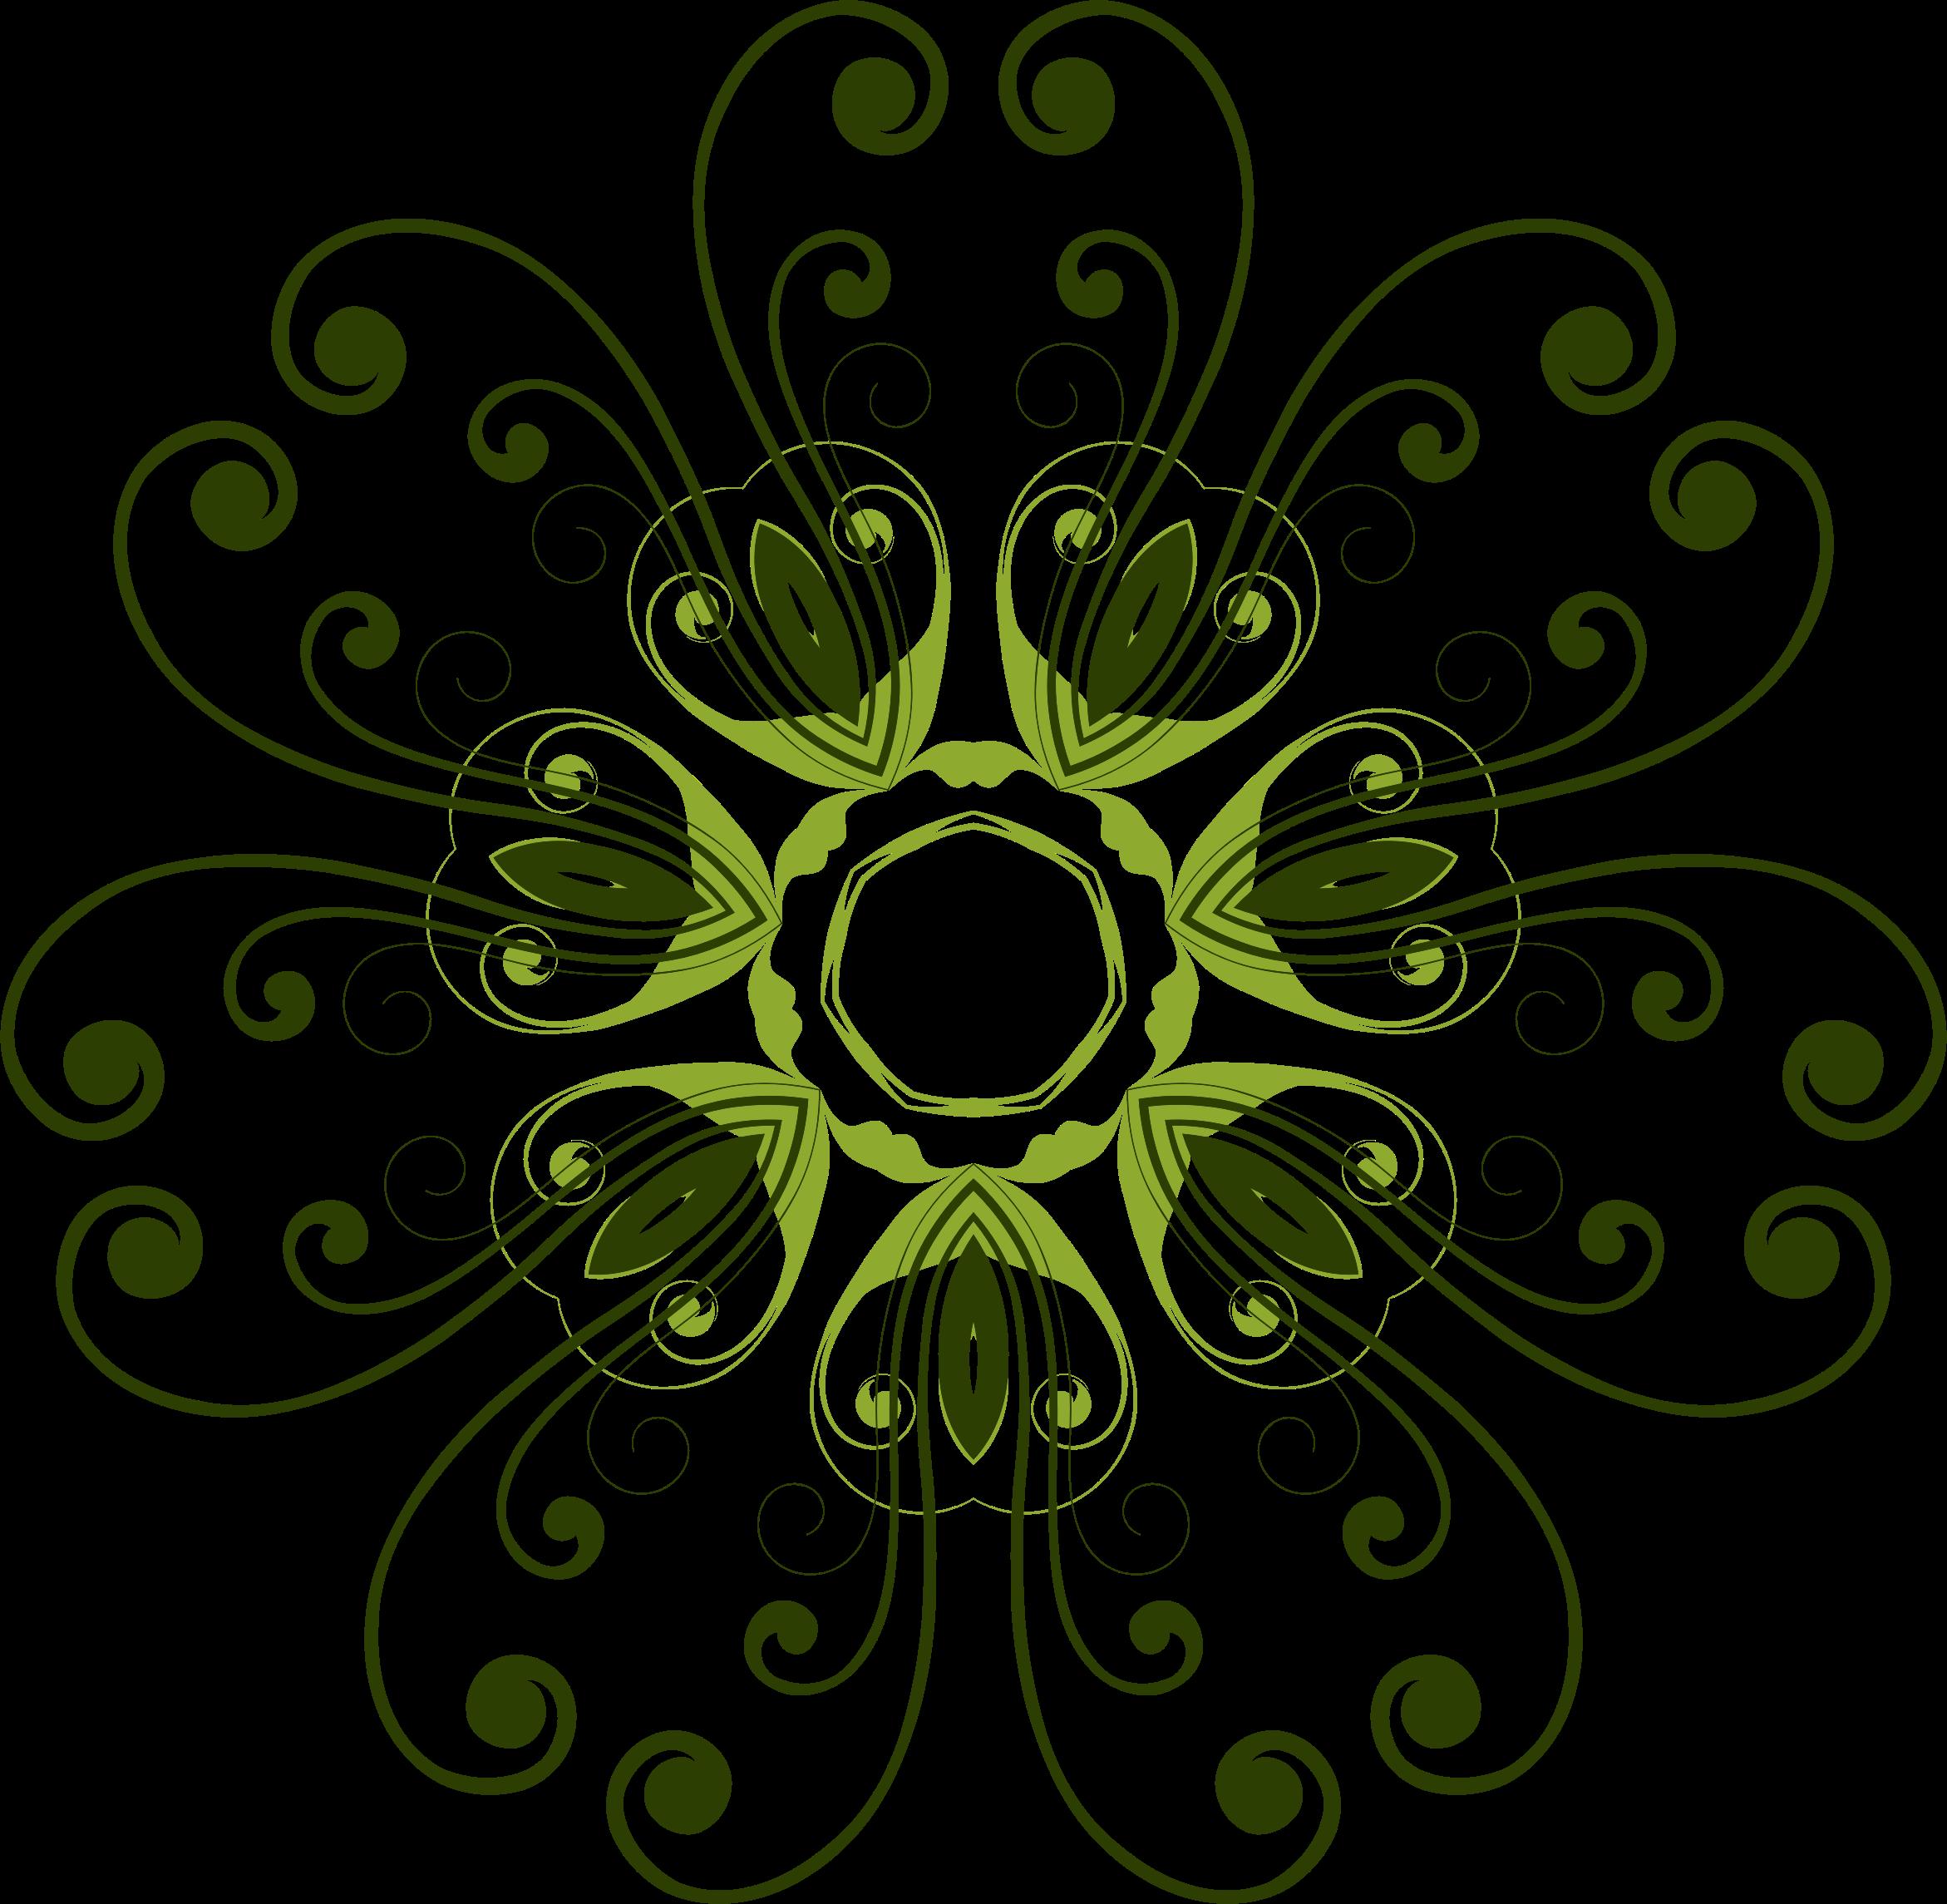 Flower design png. Clipart flourish big image